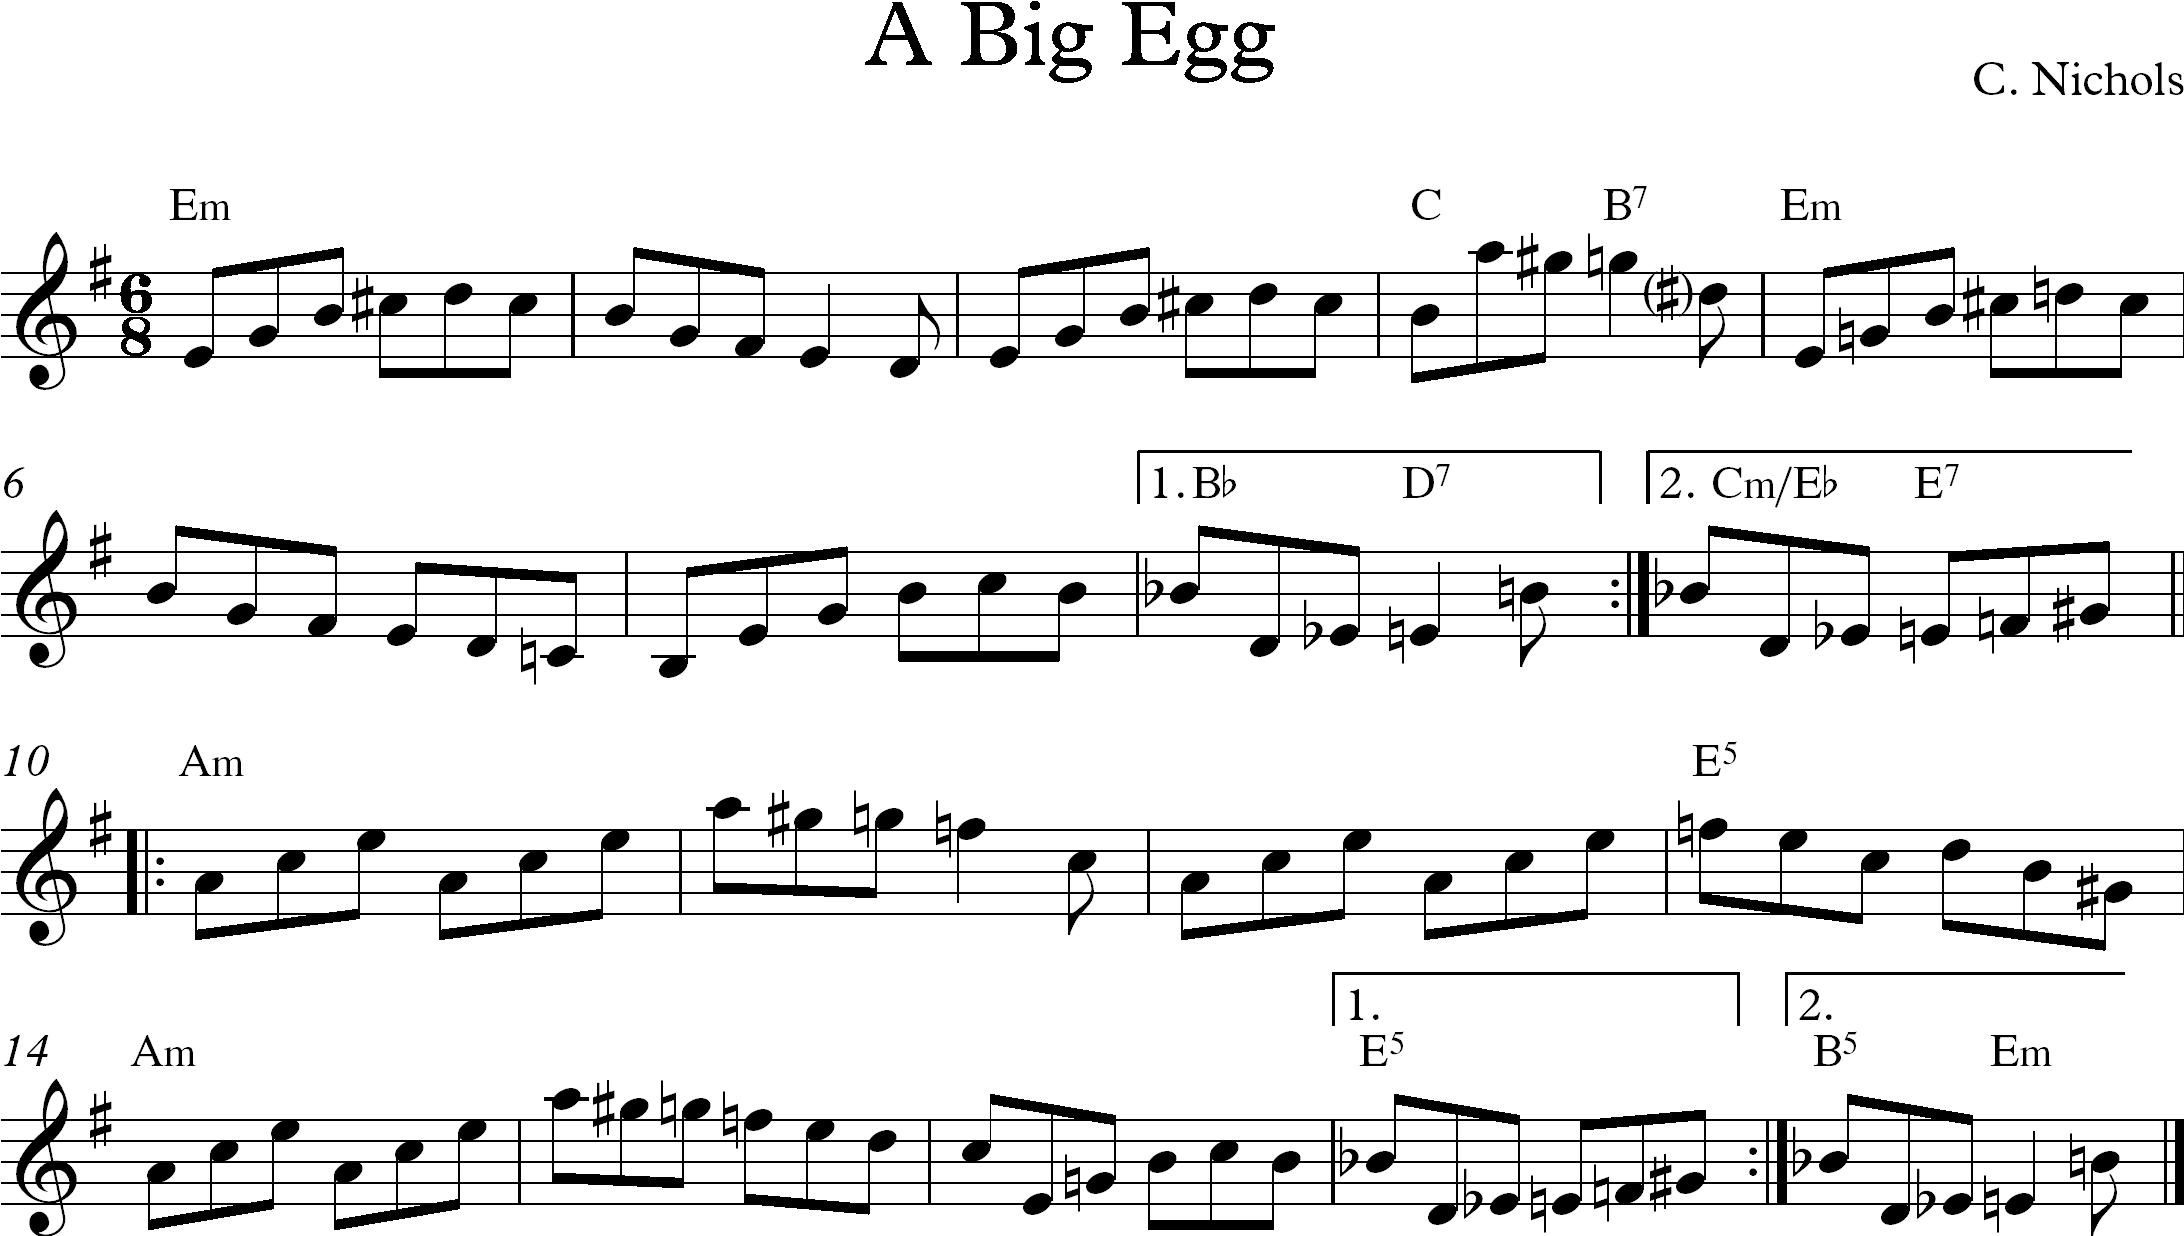 Big Egg Chris Nichols Tunes